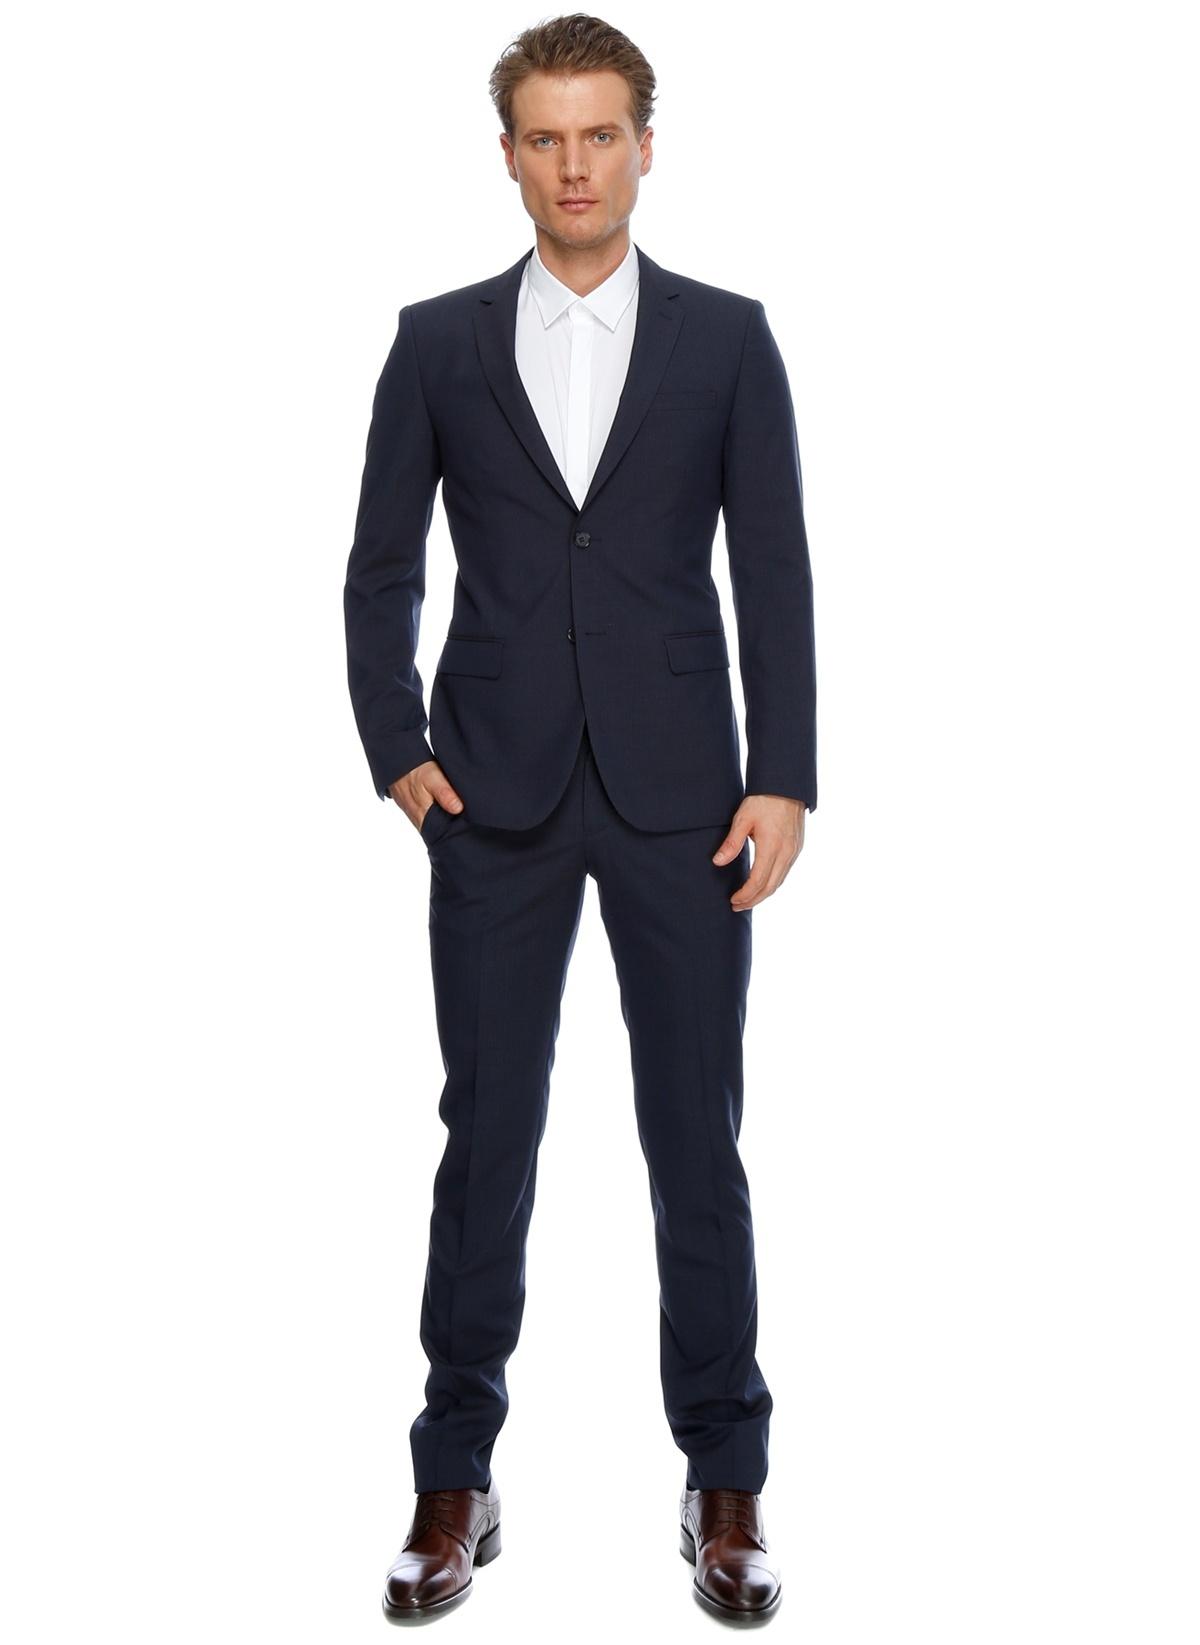 Fabrika Takım Elbise 72yel Fanse-ku – Part-19-252 Fbe – 799.99 TL